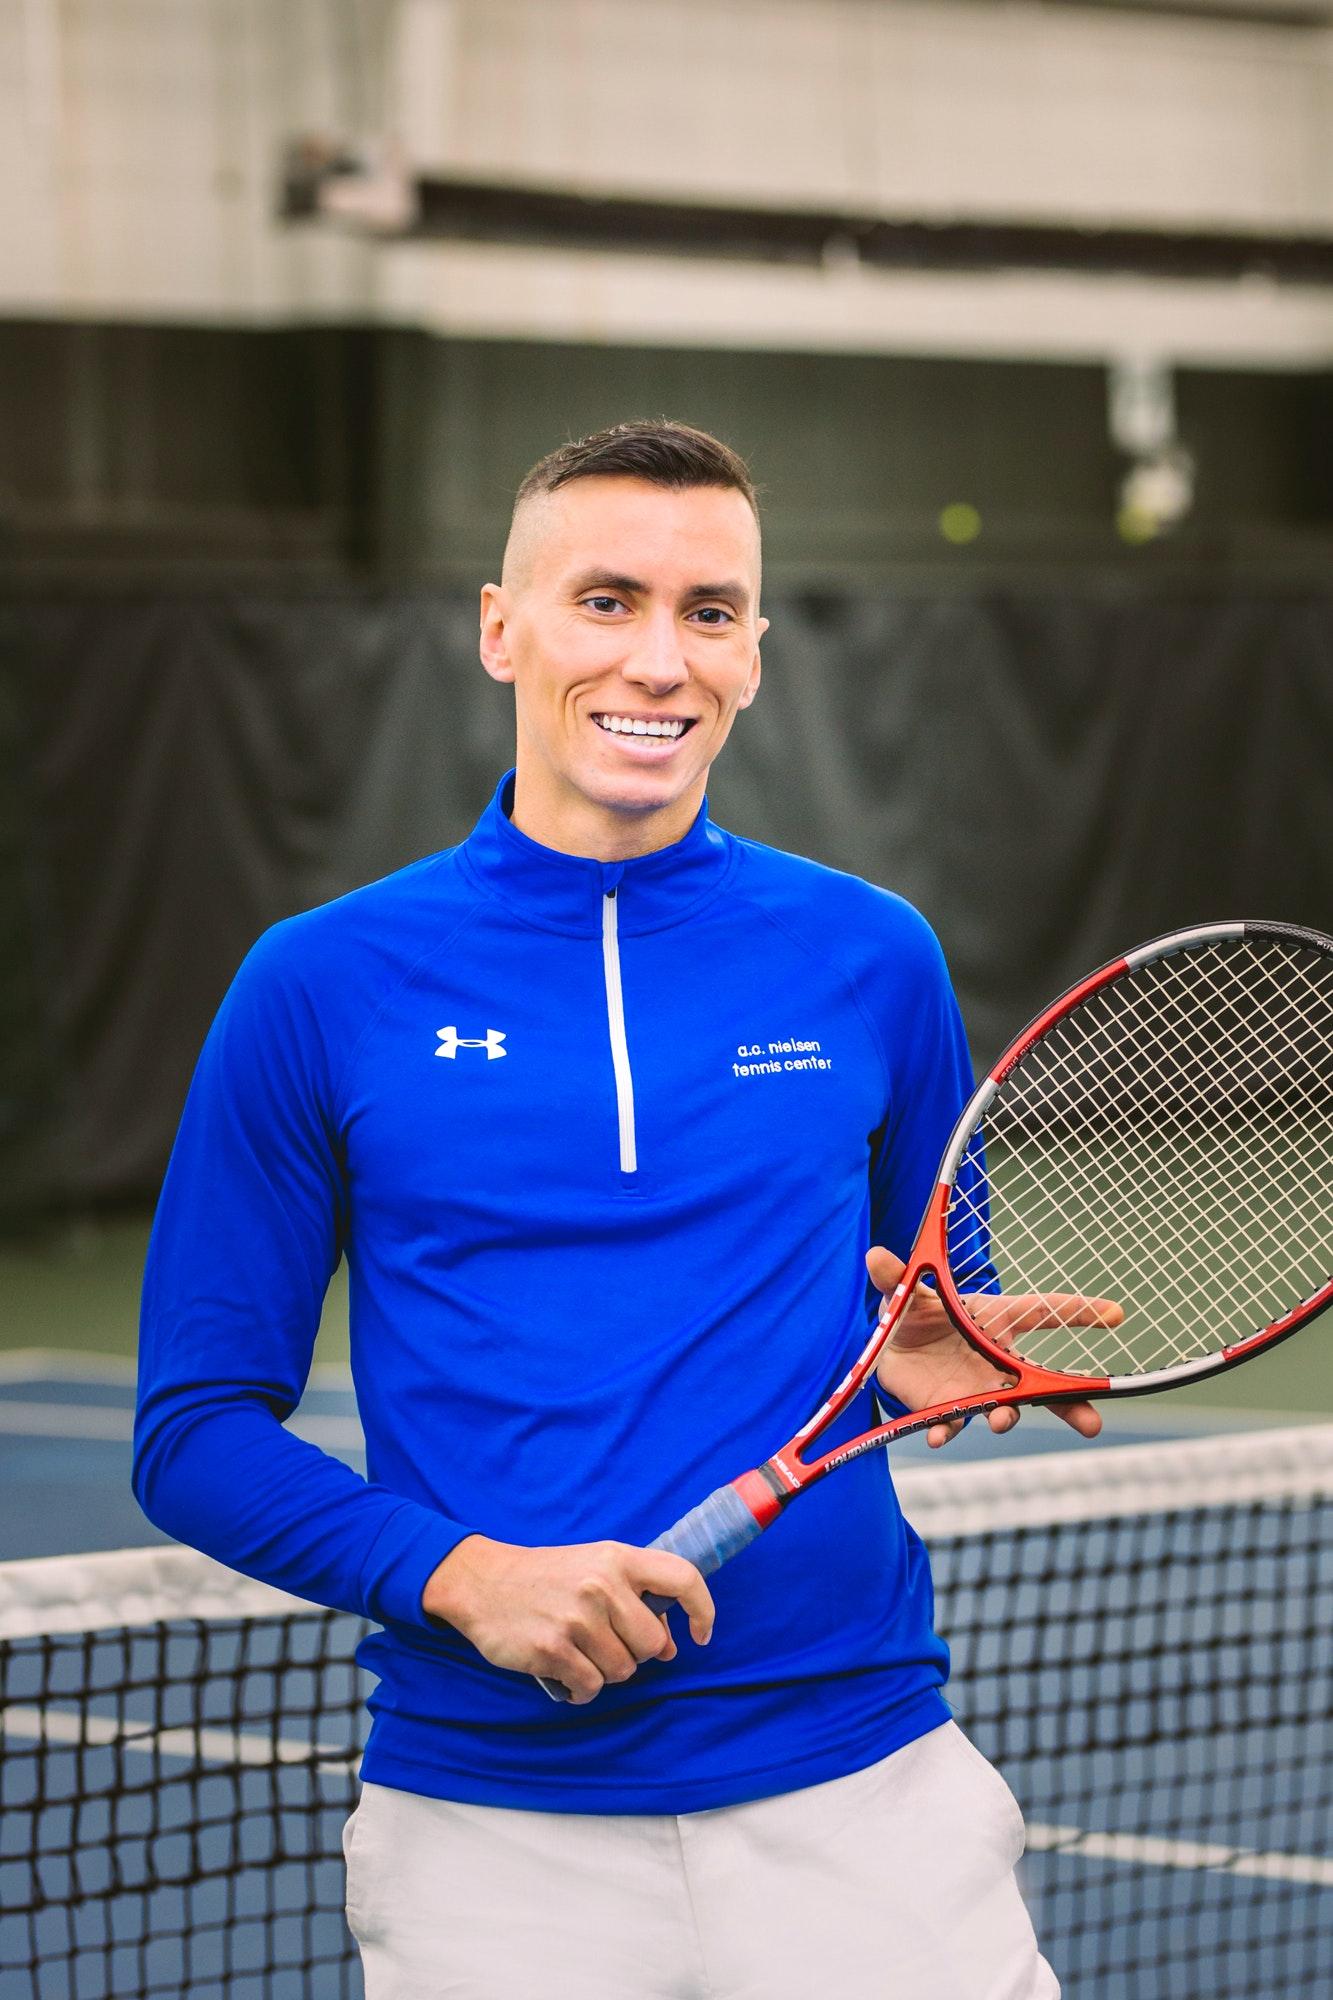 Lukasz L. teaches tennis lessons in Park Ridge, IL